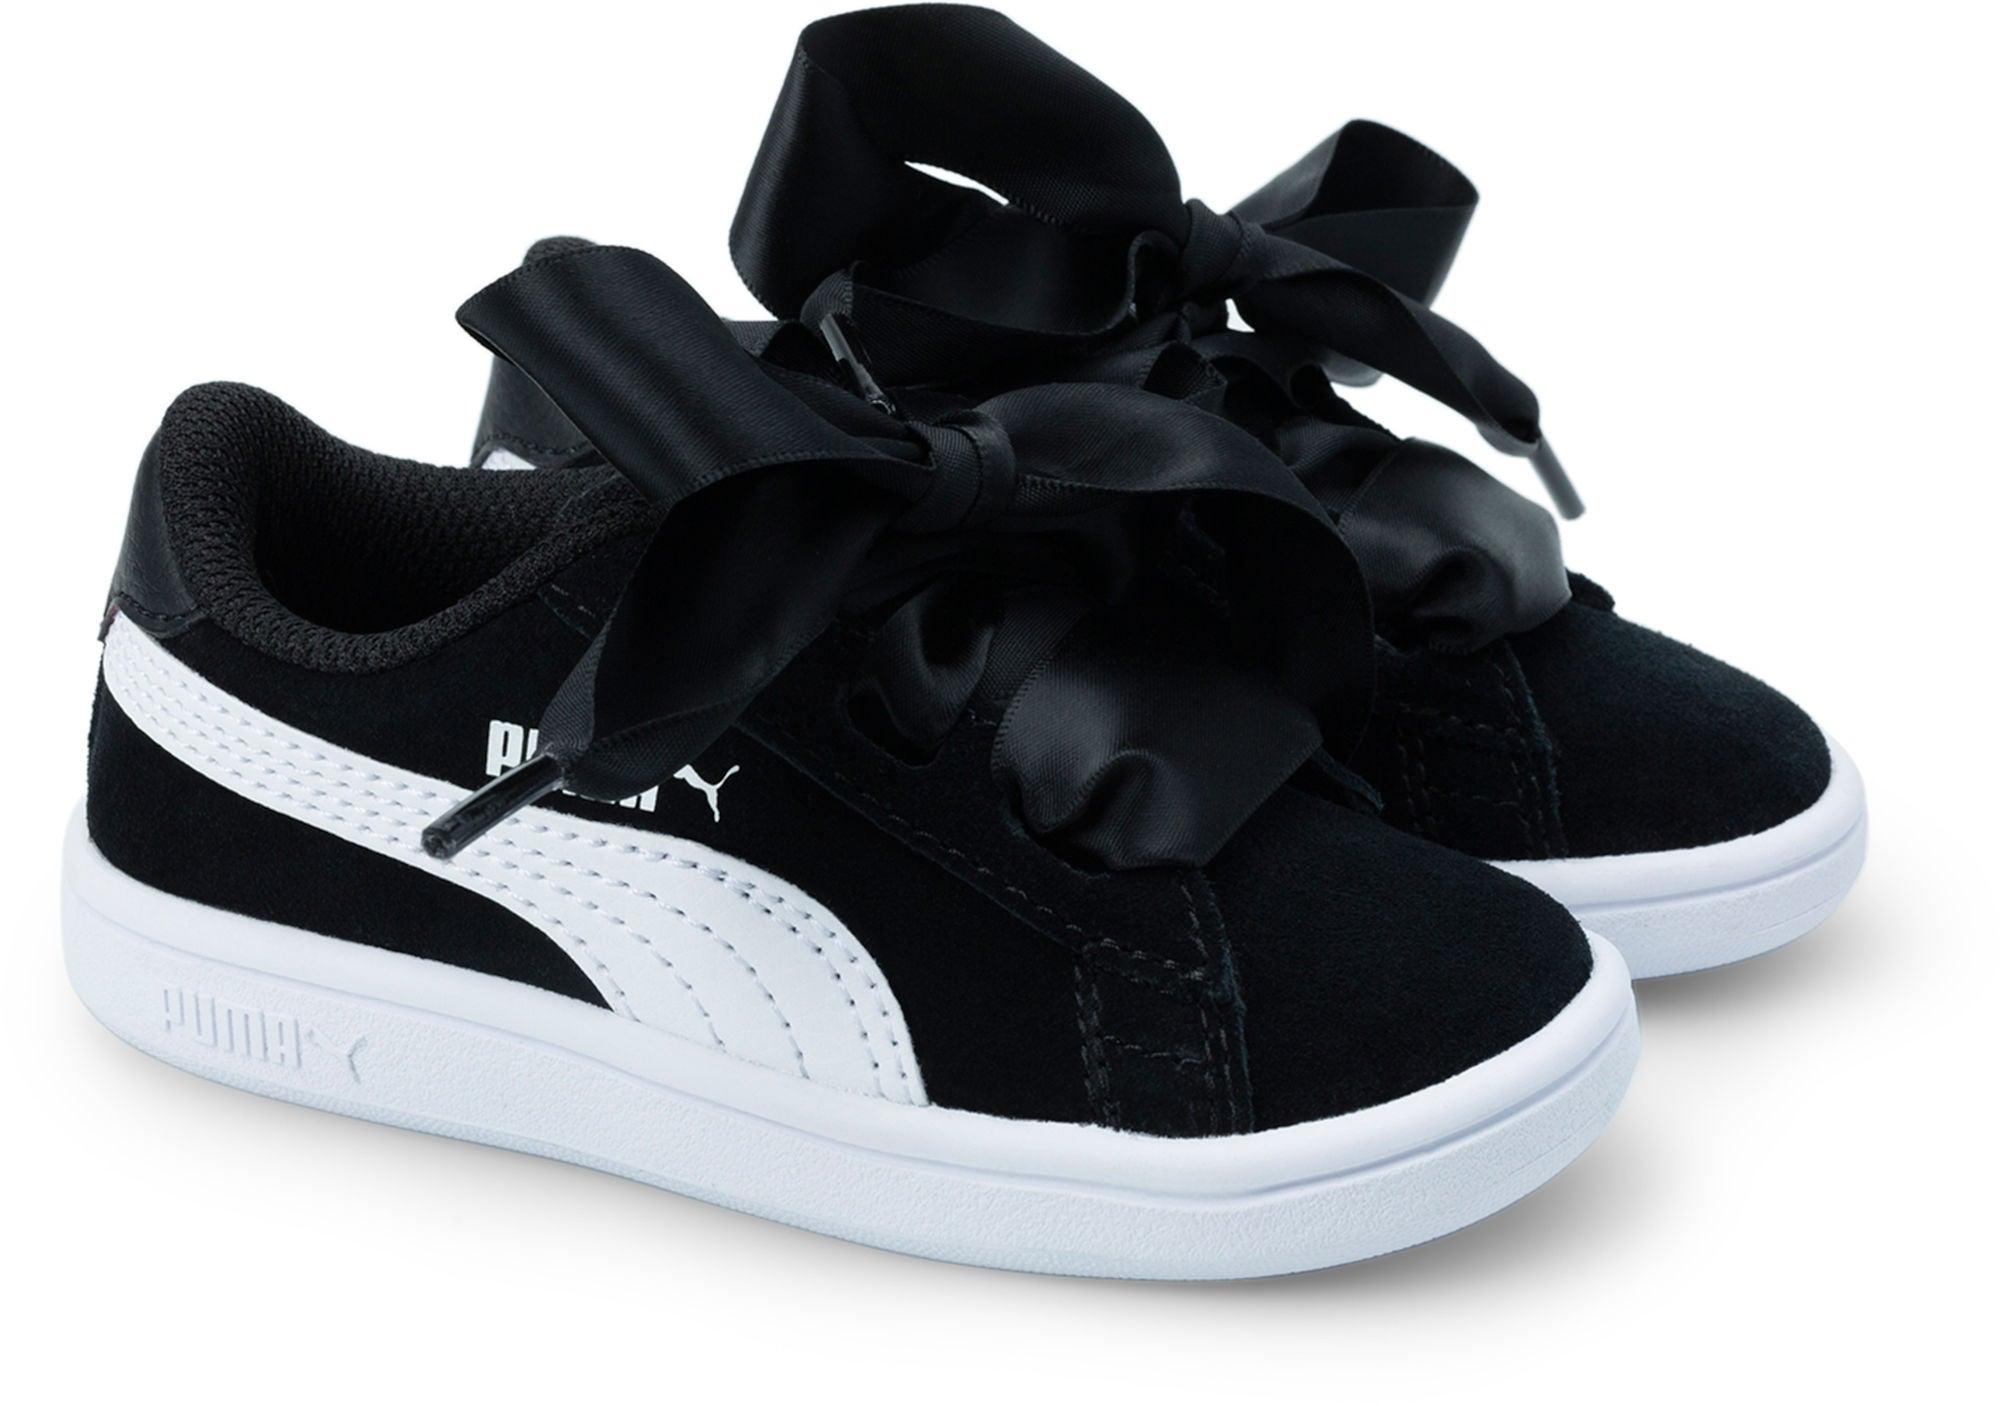 Kjøp Puma Smash V2 Ribbon AC Sneaker, BlackWhite | Jollyroom